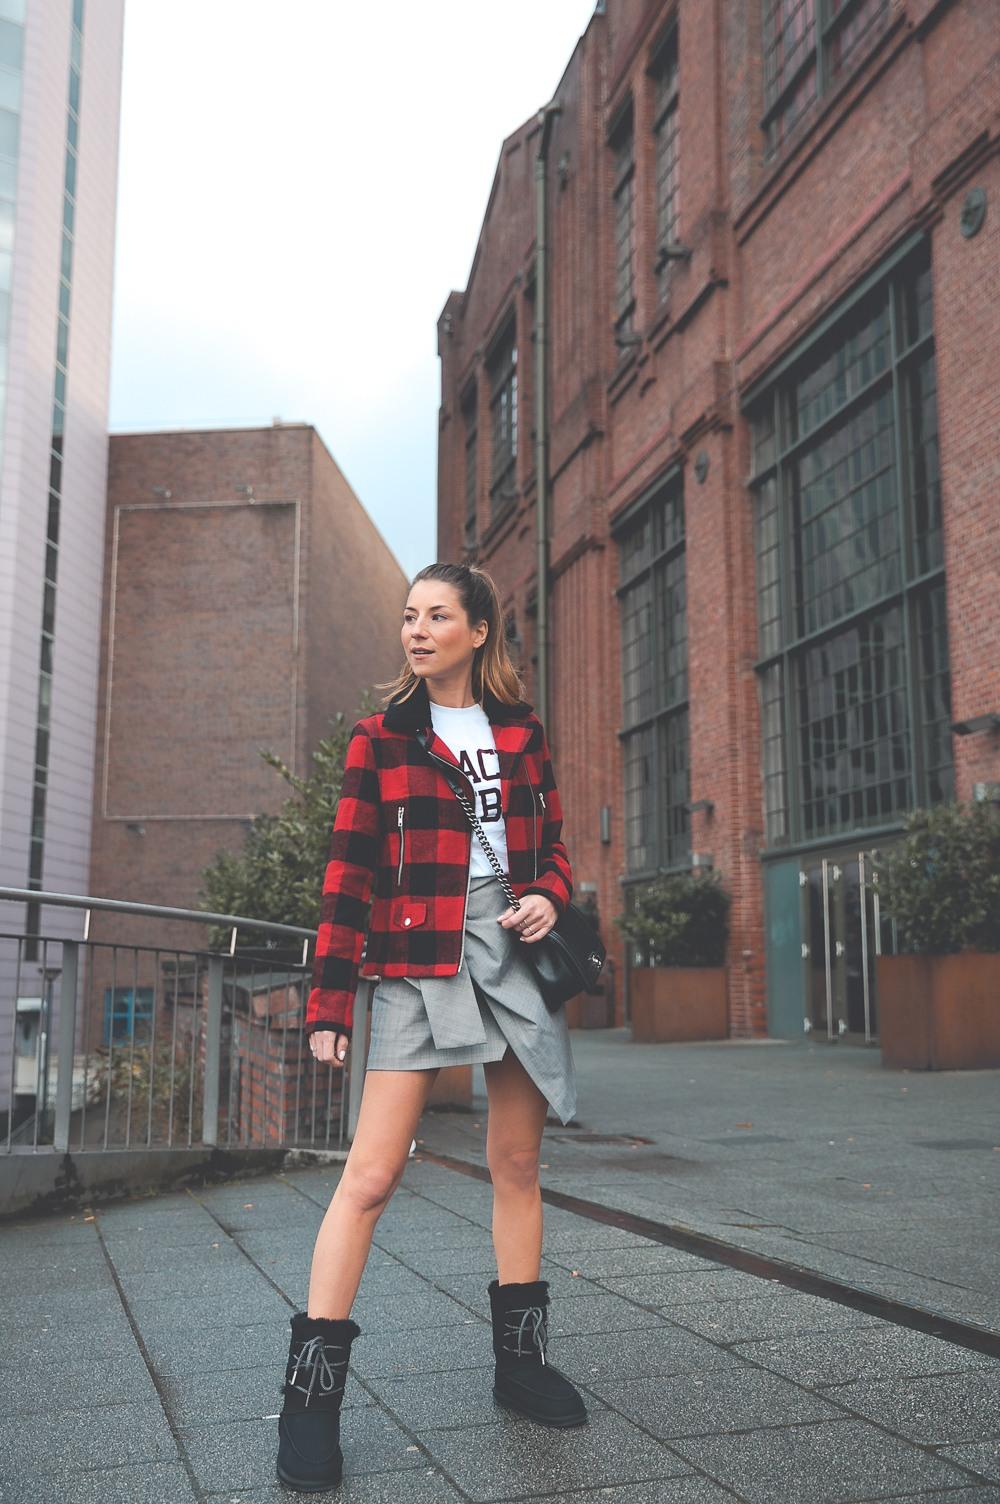 Kuschelige Winter Boots & rot schwarz karierte Jacke